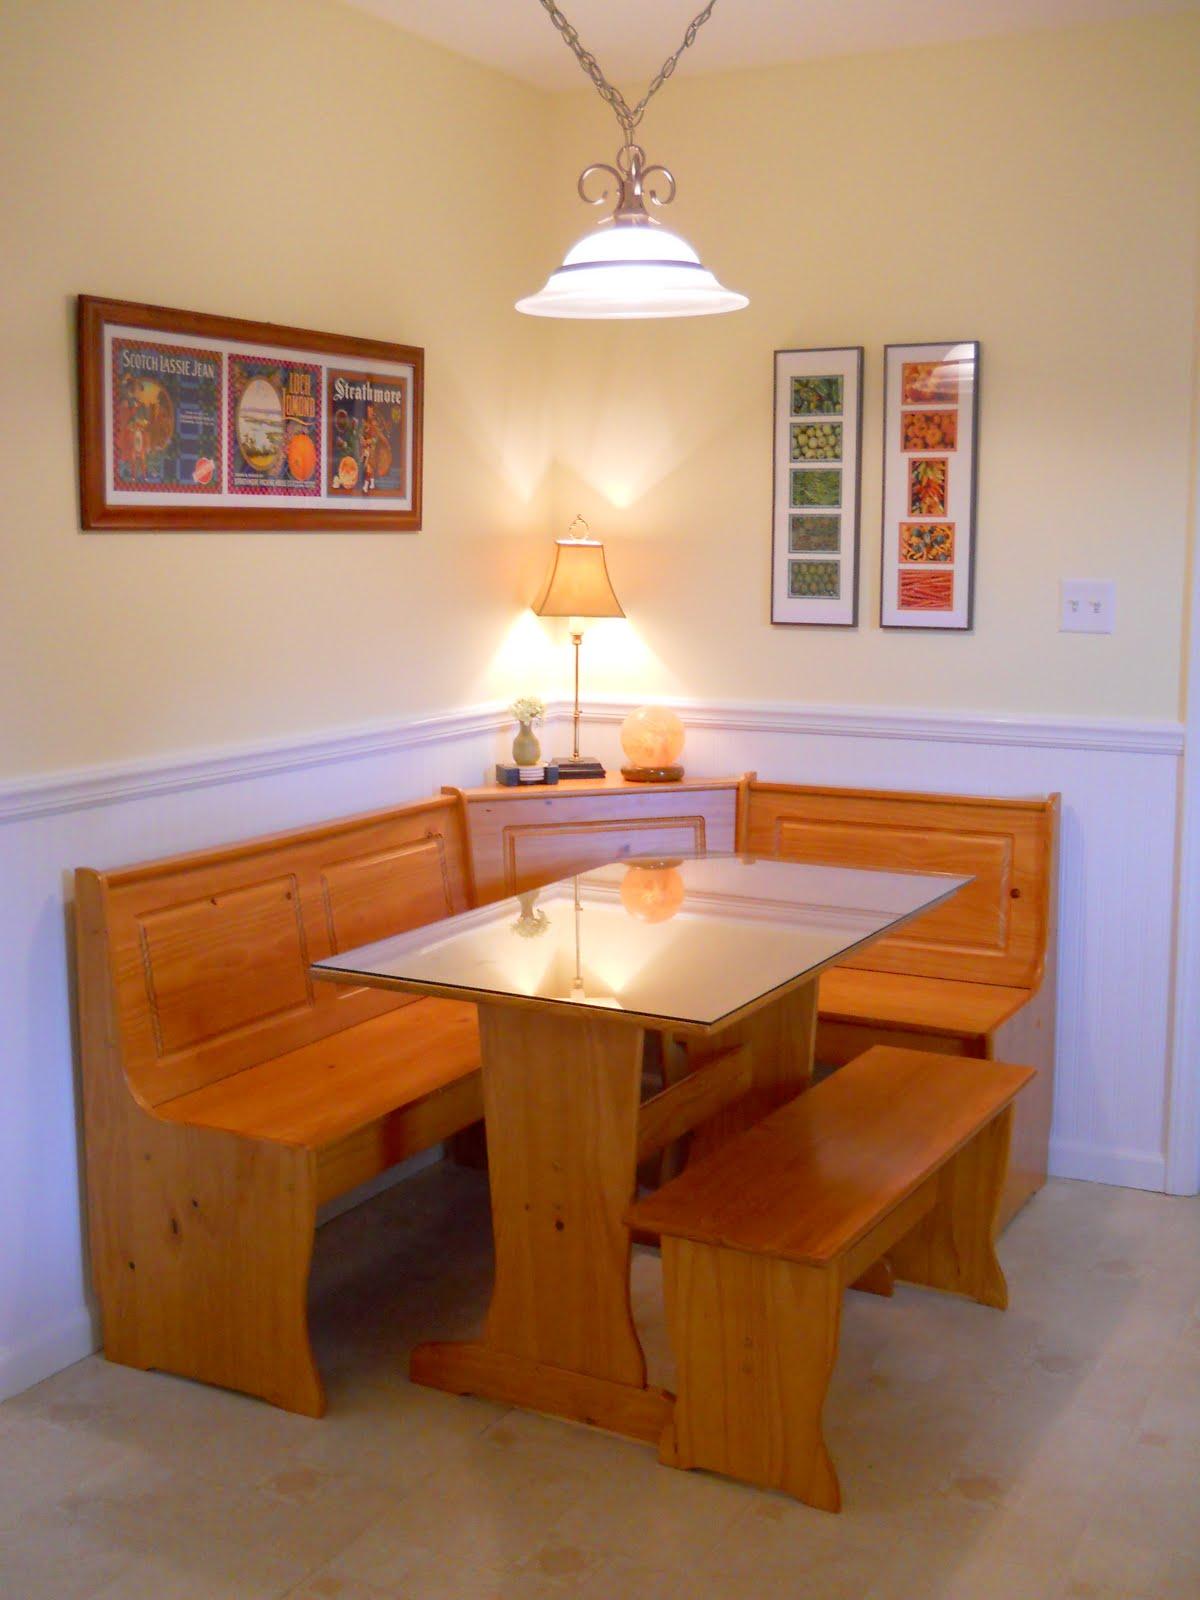 http://4.bp.blogspot.com/-sOdea0vFxc4/TytjvruB7eI/AAAAAAAAAus/Ib75BeFwJDE/s1600/Home_Improvements_2011_090.JPG